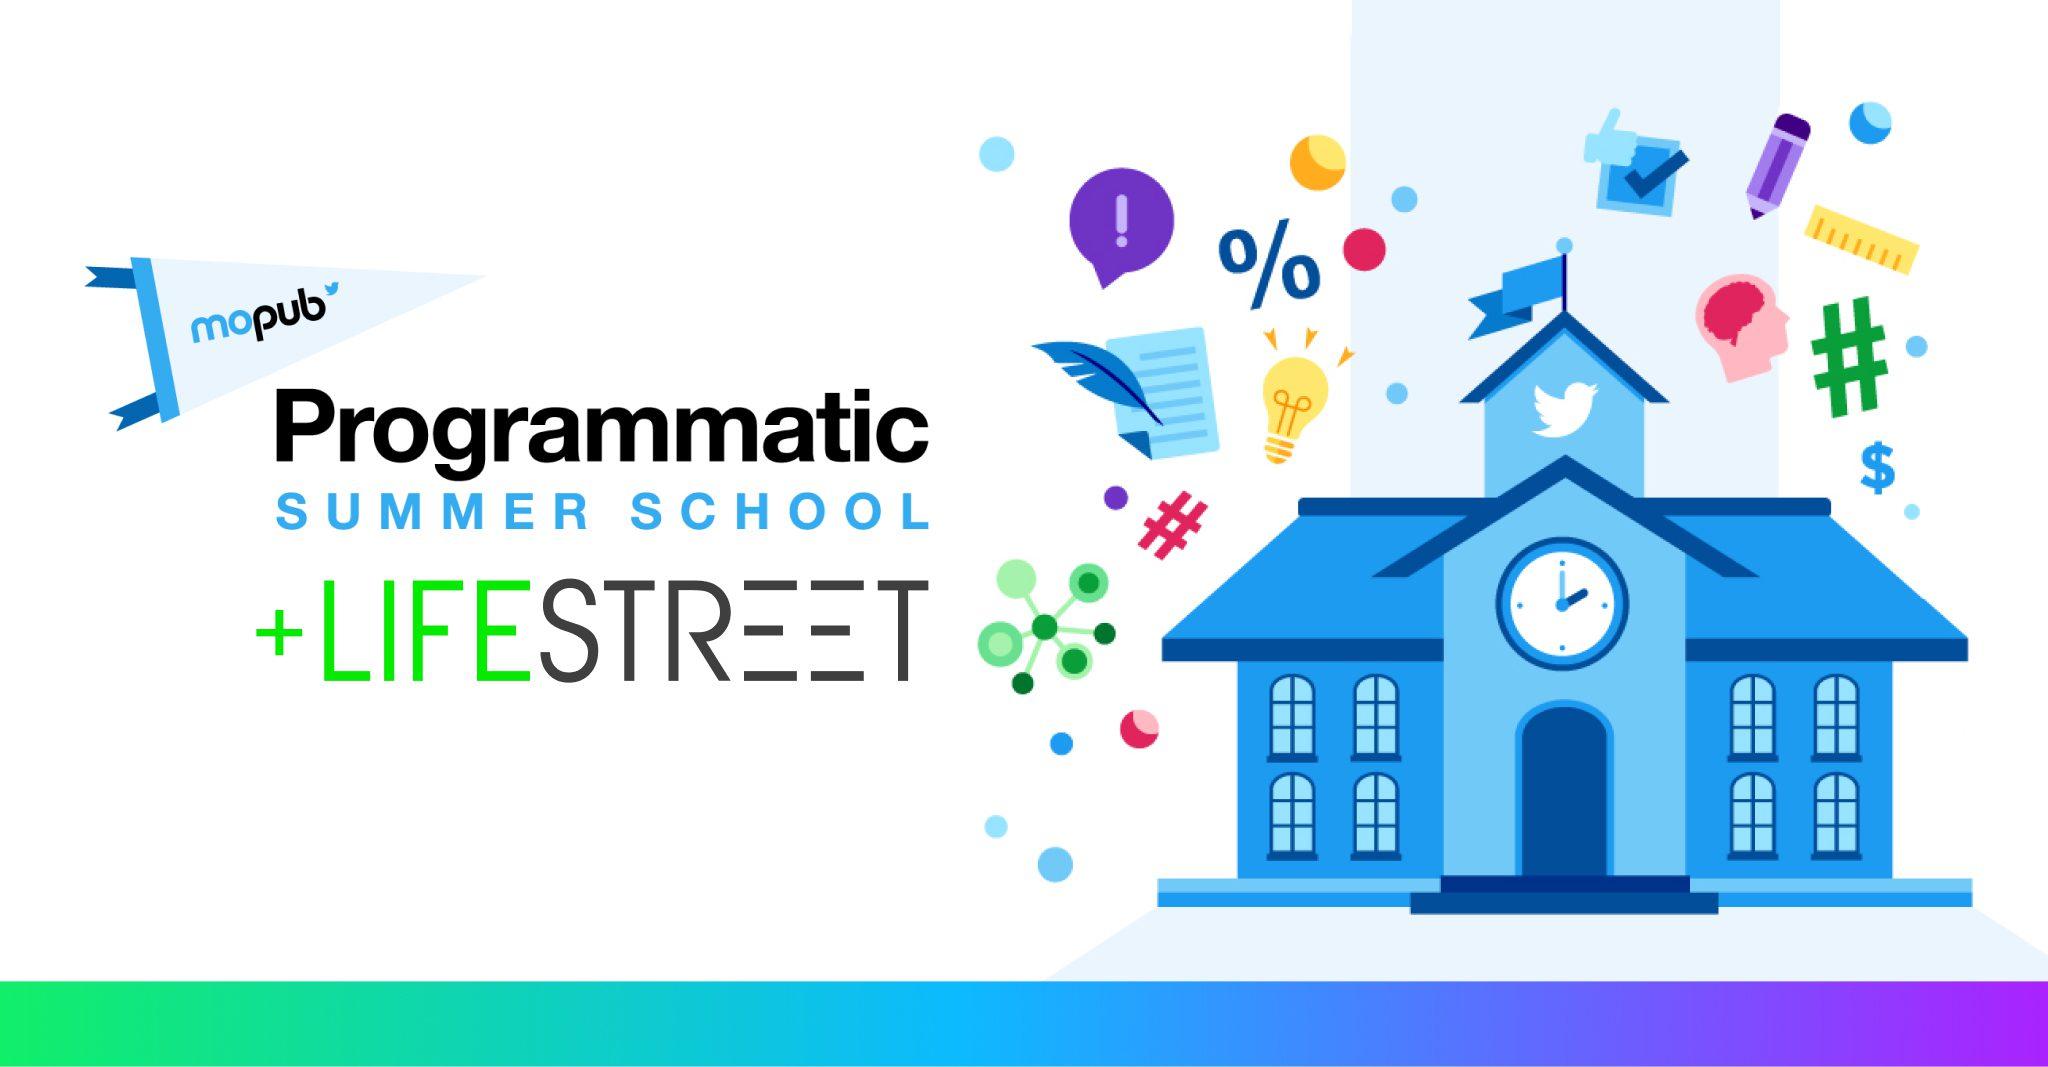 Webinar for MoPub's programmatic summer school + LifeStreet